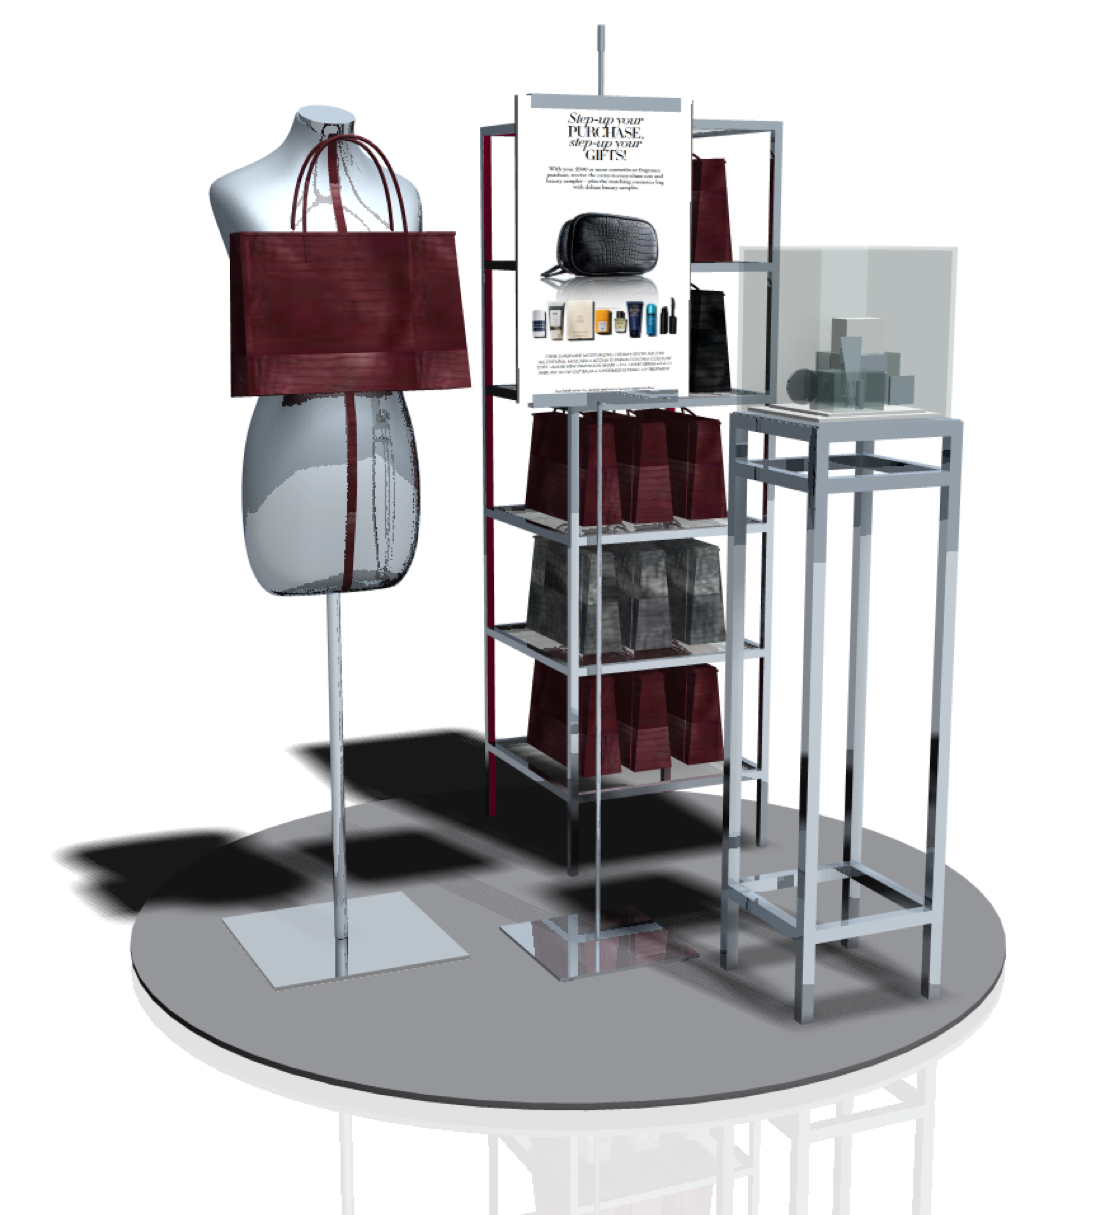 vertical displays design handbags